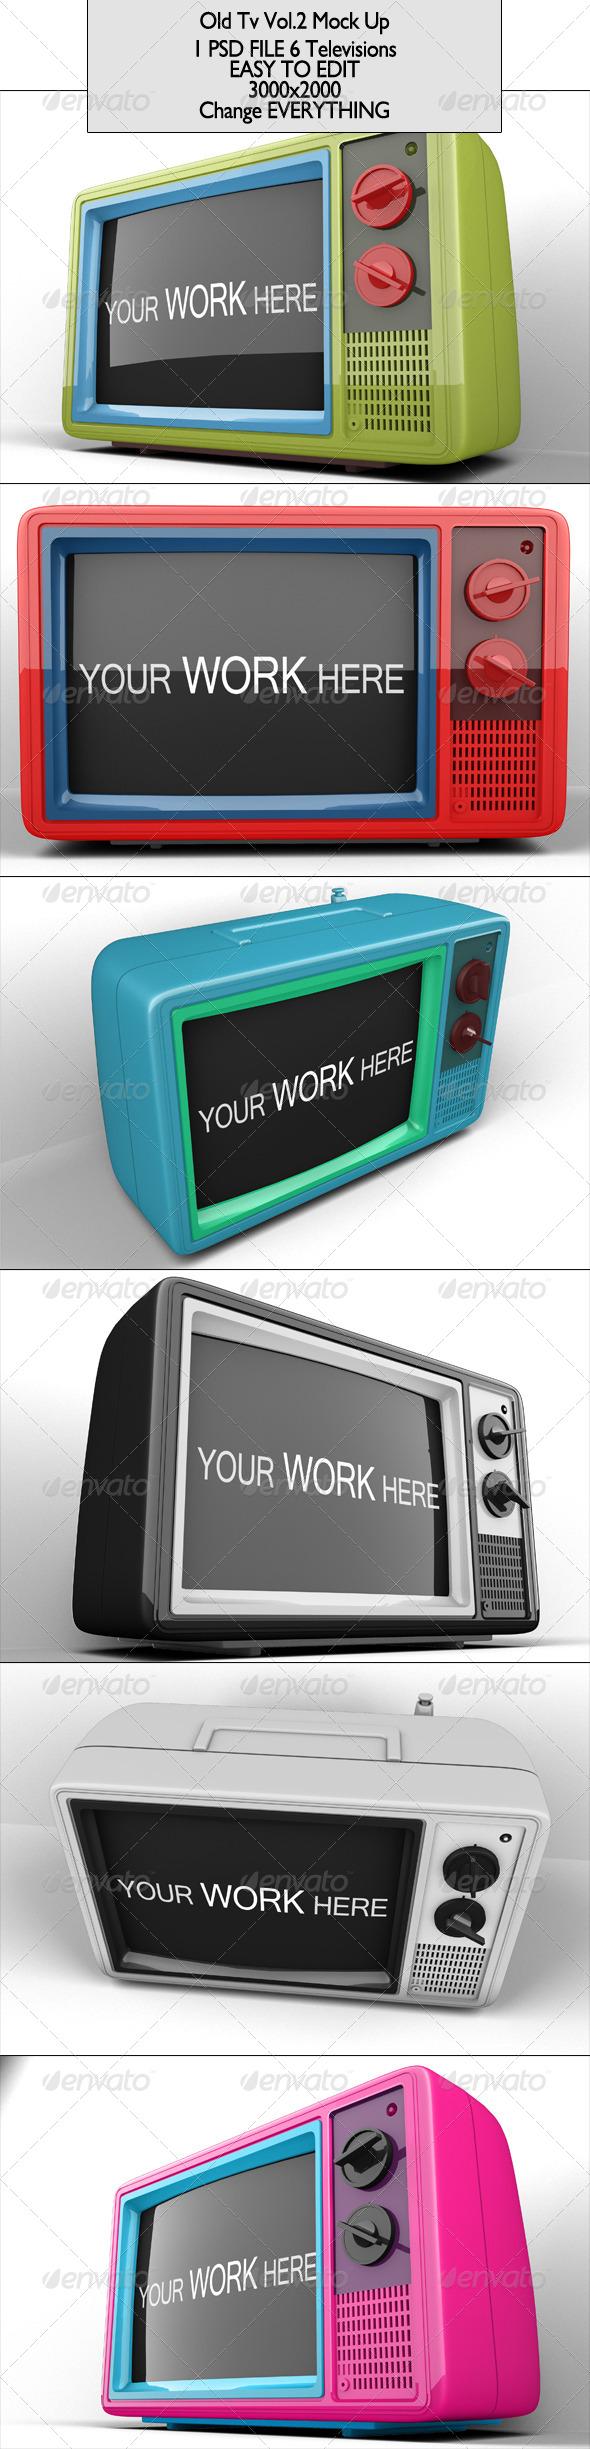 GraphicRiver Old Tv Mock Up Vol 2 6887660